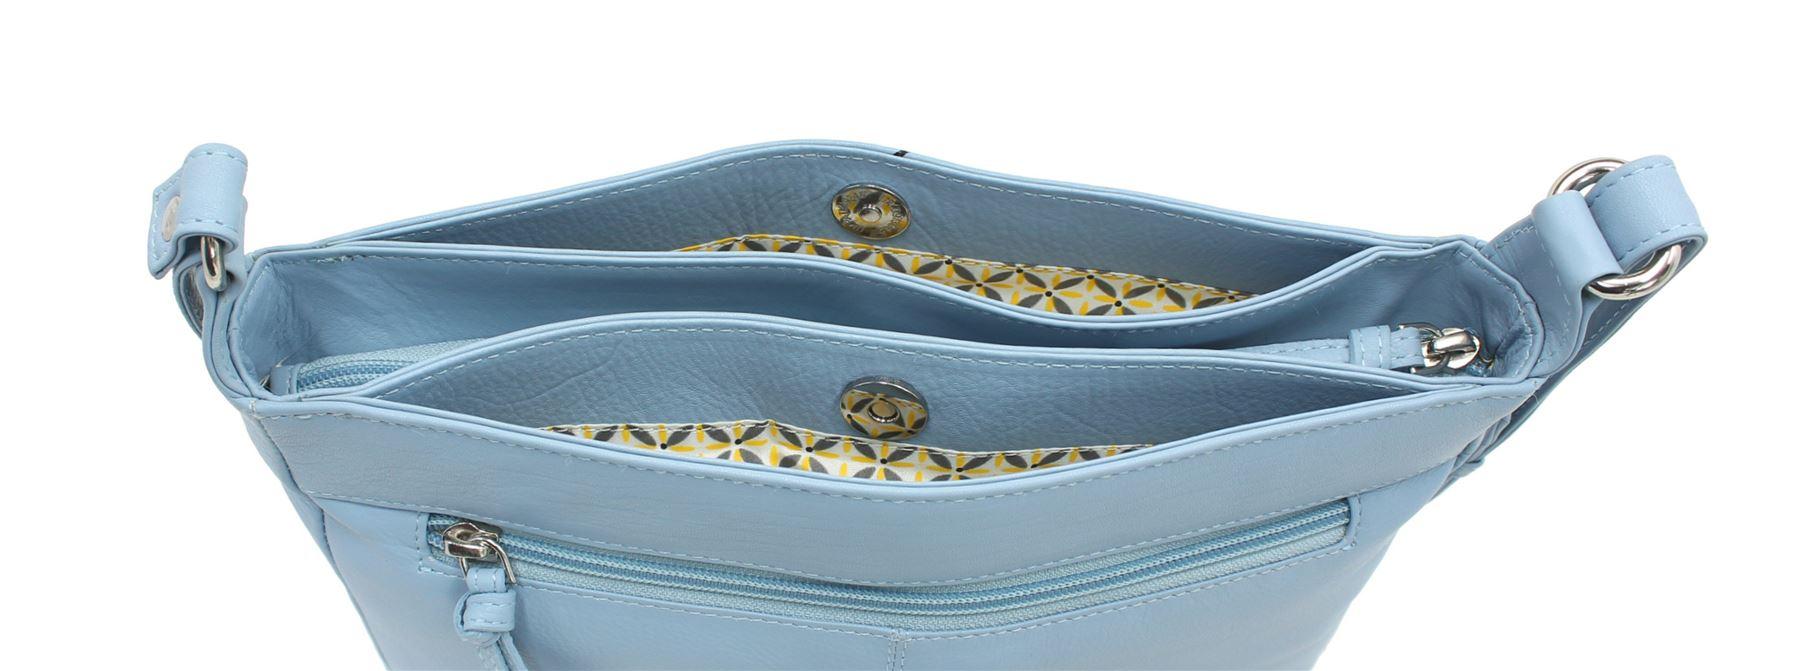 Mala Leather Sewing Room Collection Leather Shoulder Cross Body Bag Bag Bag 7147_22 | Neue Sorten werden eingeführt  bb2833